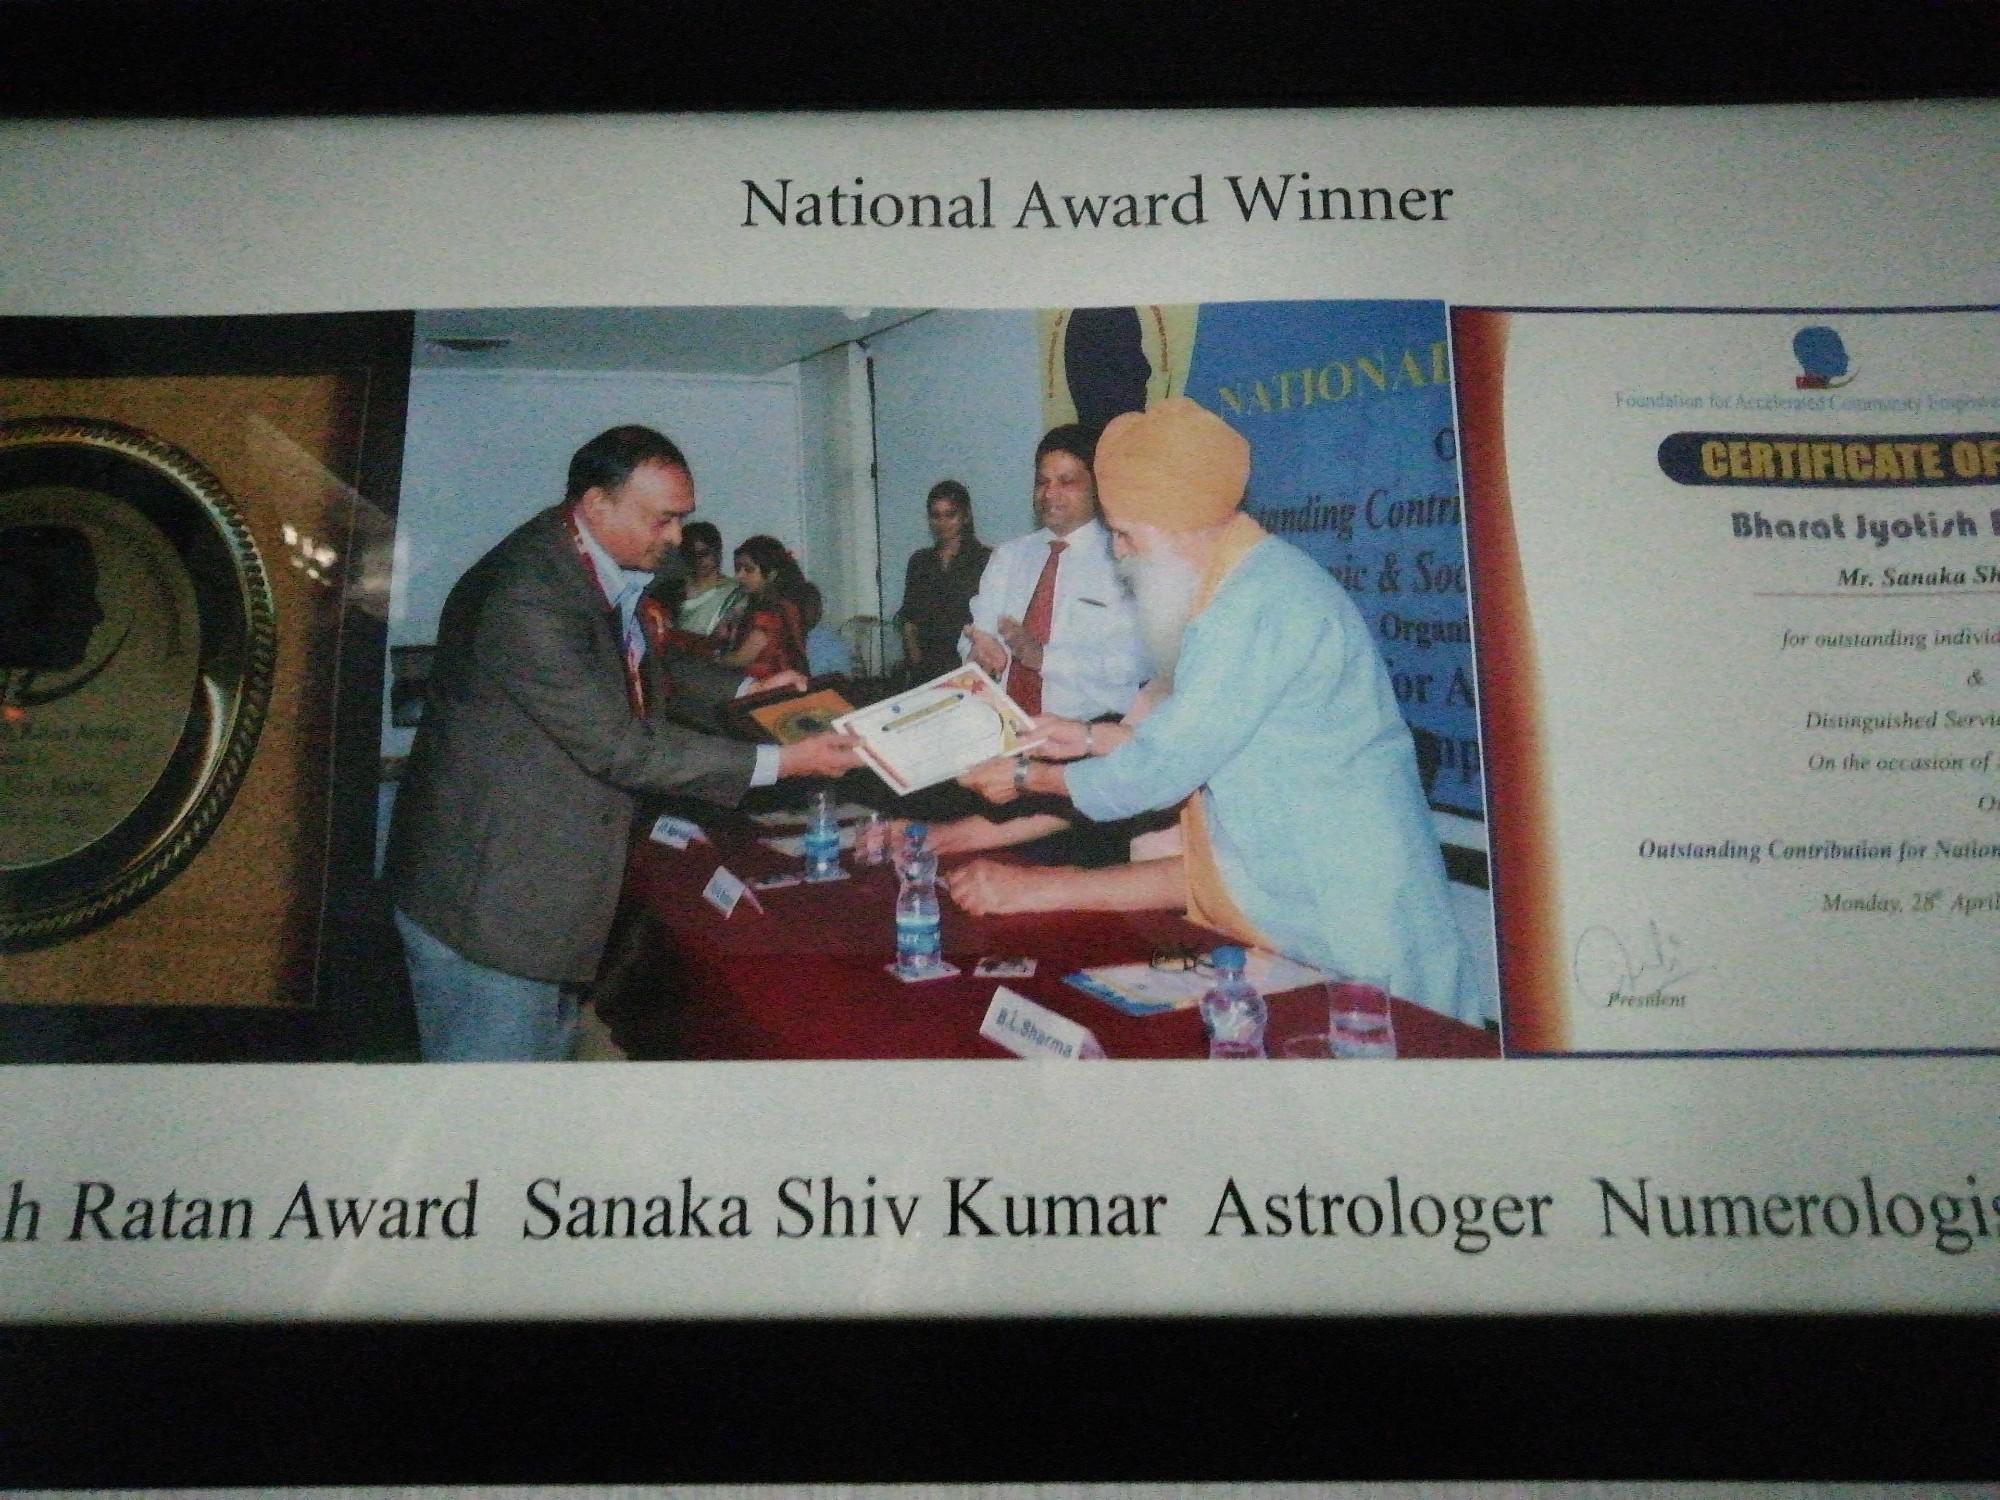 Tara Astrology Com in Secunderabad, Hyderabad-500017 | Sulekha Hyderabad